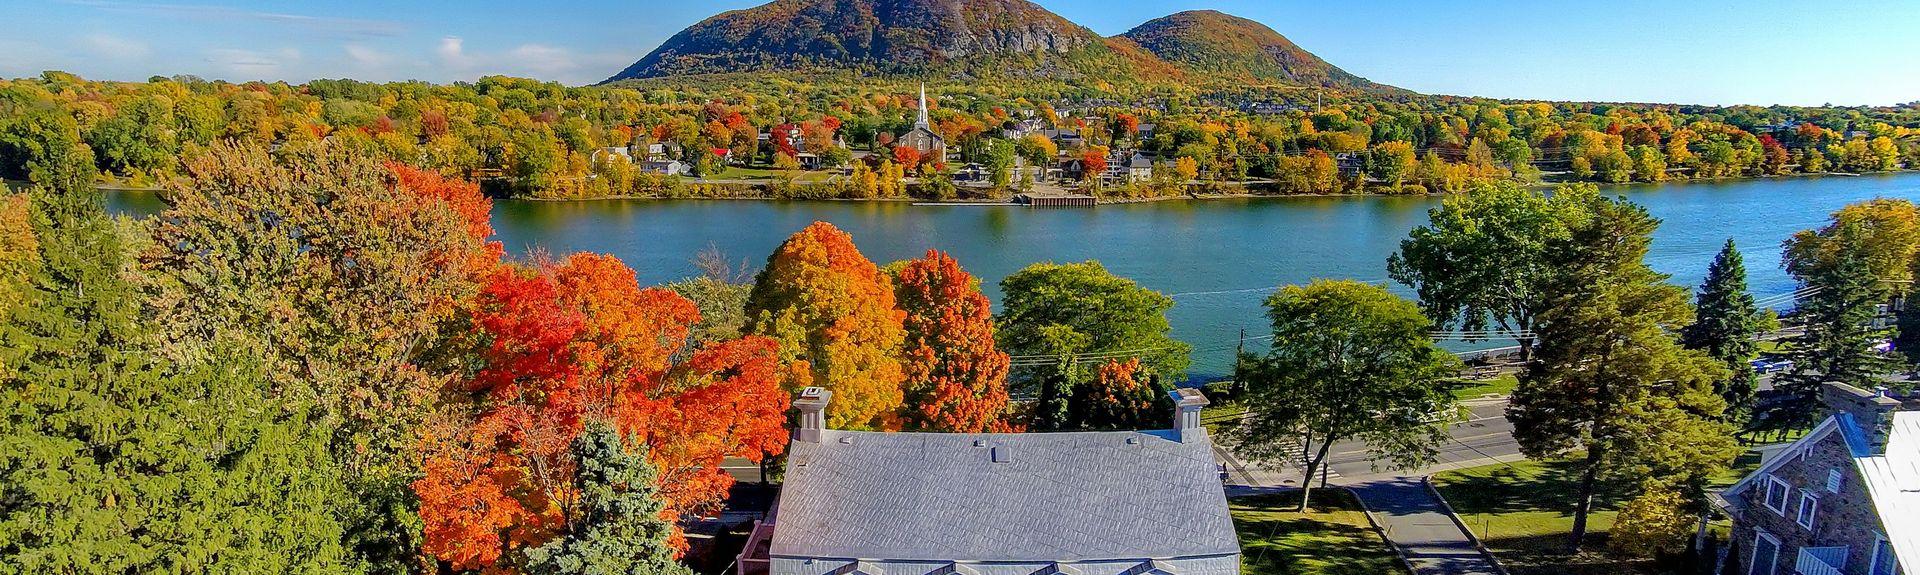 Parc Michel Chartrand, Longueuil, Quebec, Canada